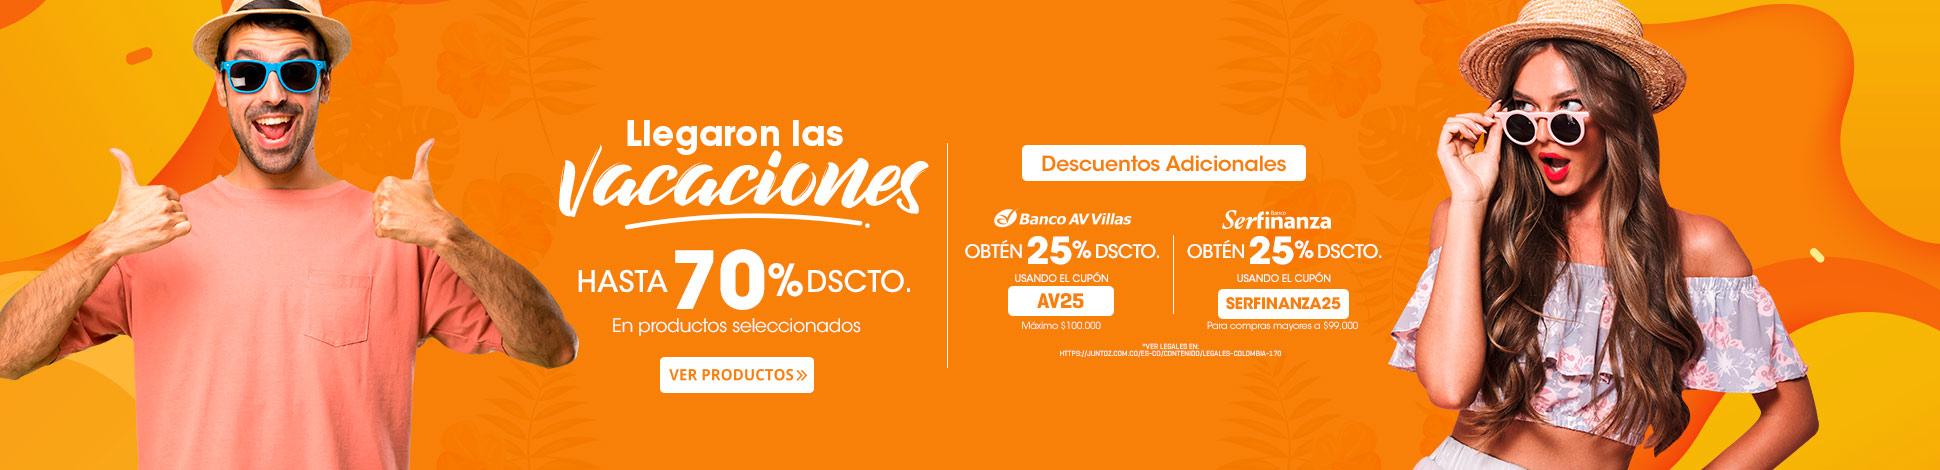 HS-LlegaronLasVacaciones.jpg | Juntoz.com